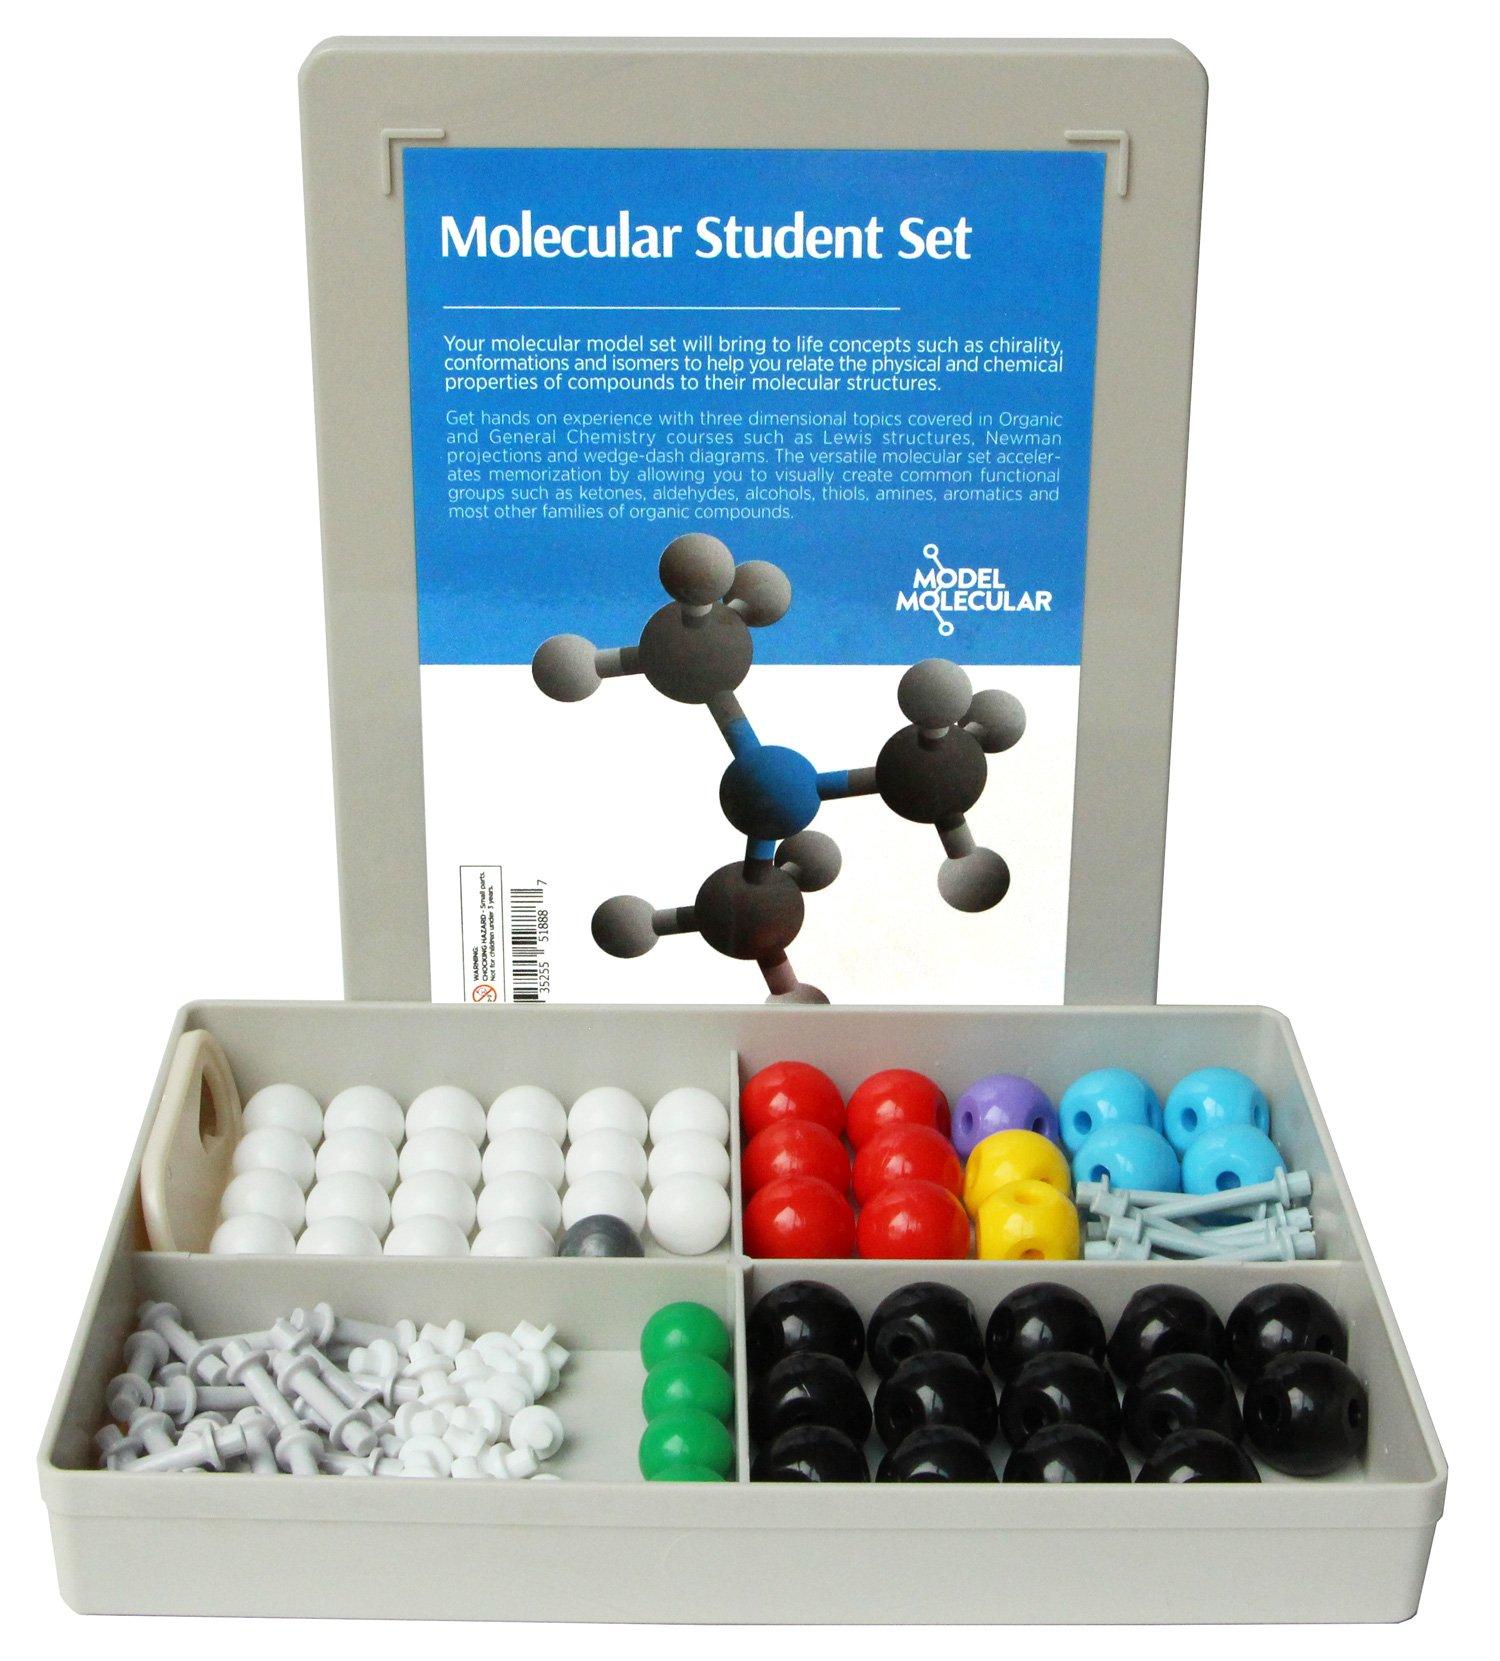 molecular model set for organic chemistry instructions